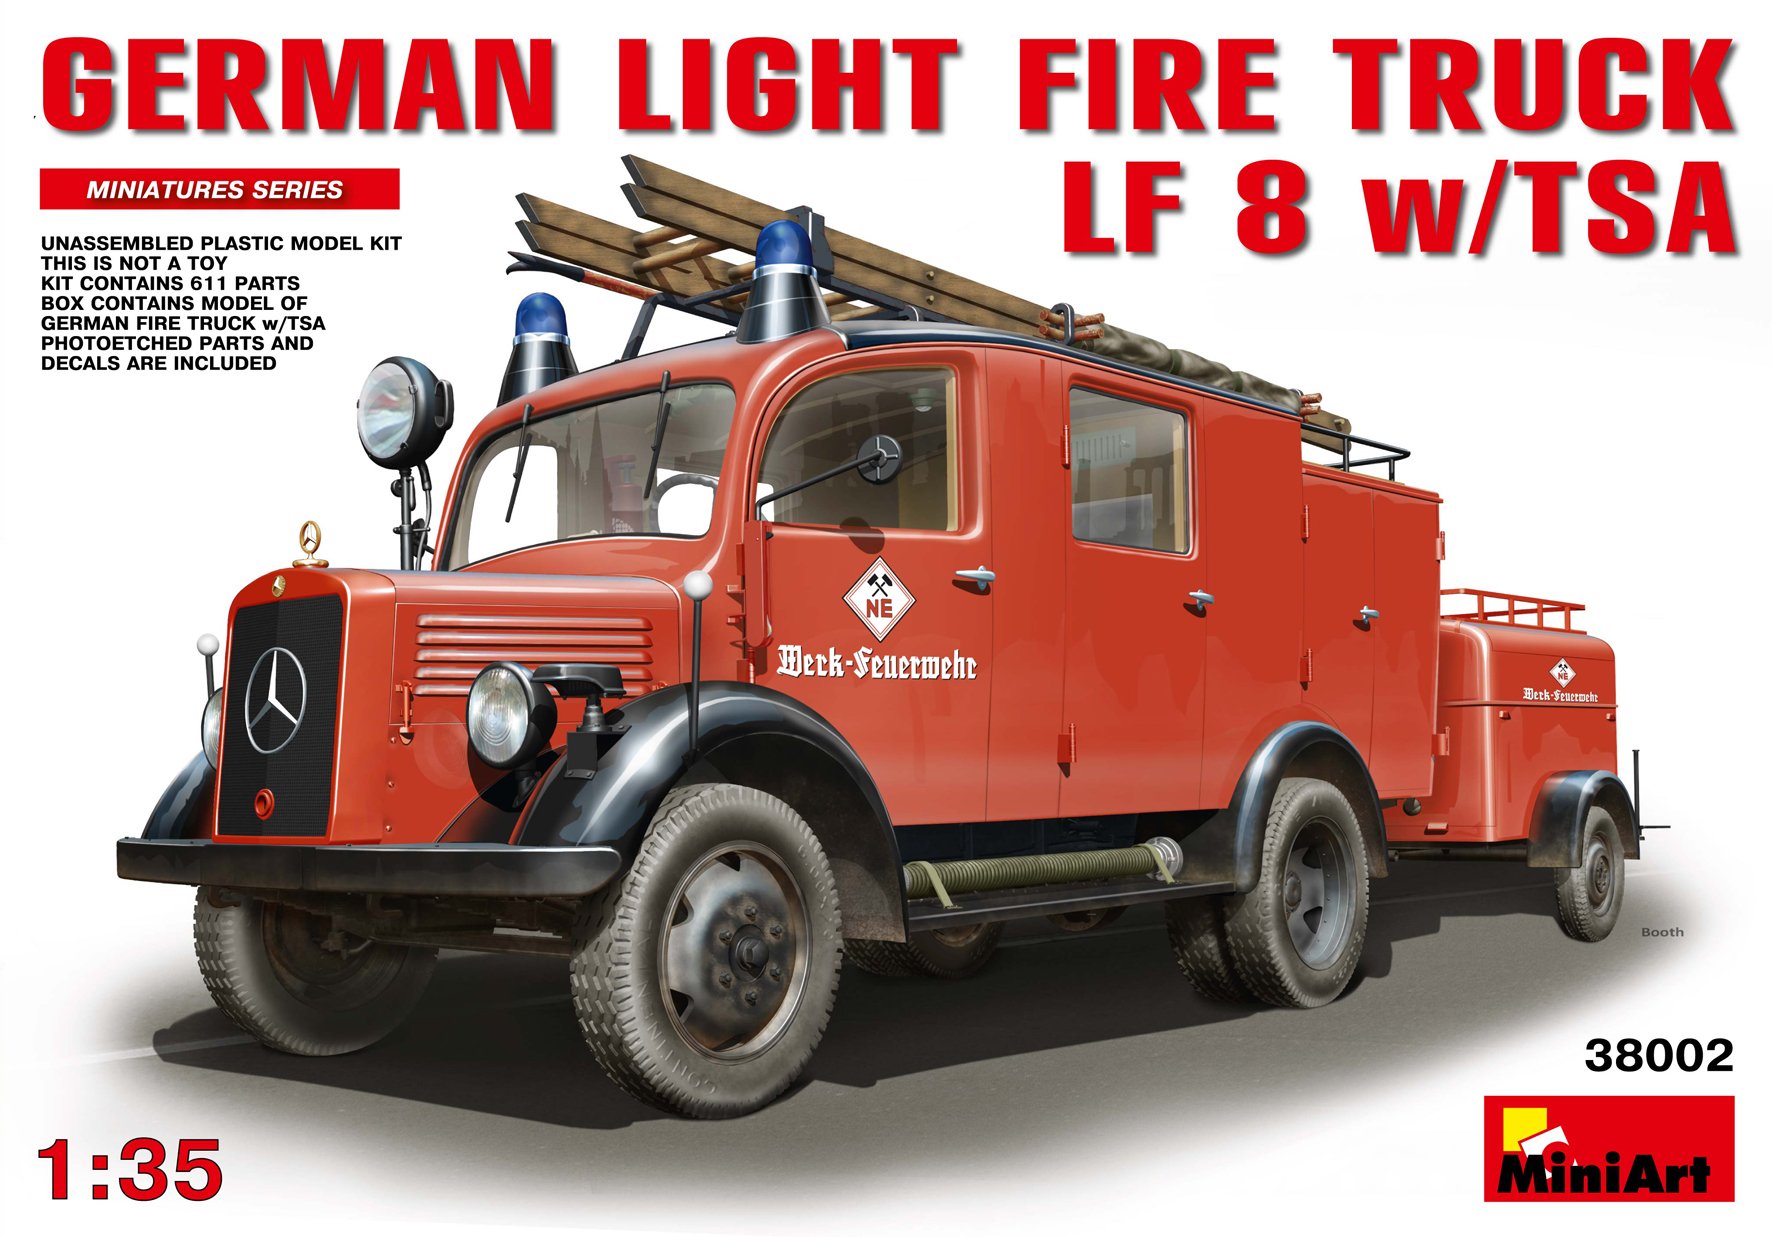 38002 GERMAN LIGHT FIRE TRUCK LF8 w/TSA